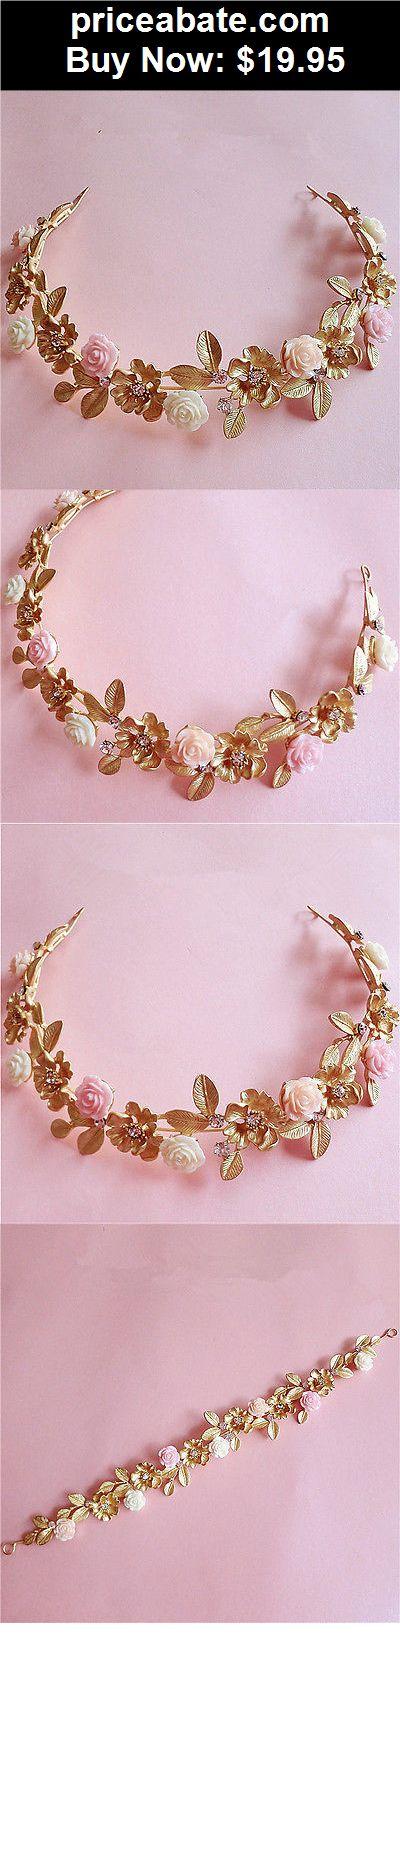 Bridal-Accessories: Wedding Bridal Crystal Rhinestone Flower Gold Headband Hair Accessories Tiara - BUY IT NOW ONLY $19.95